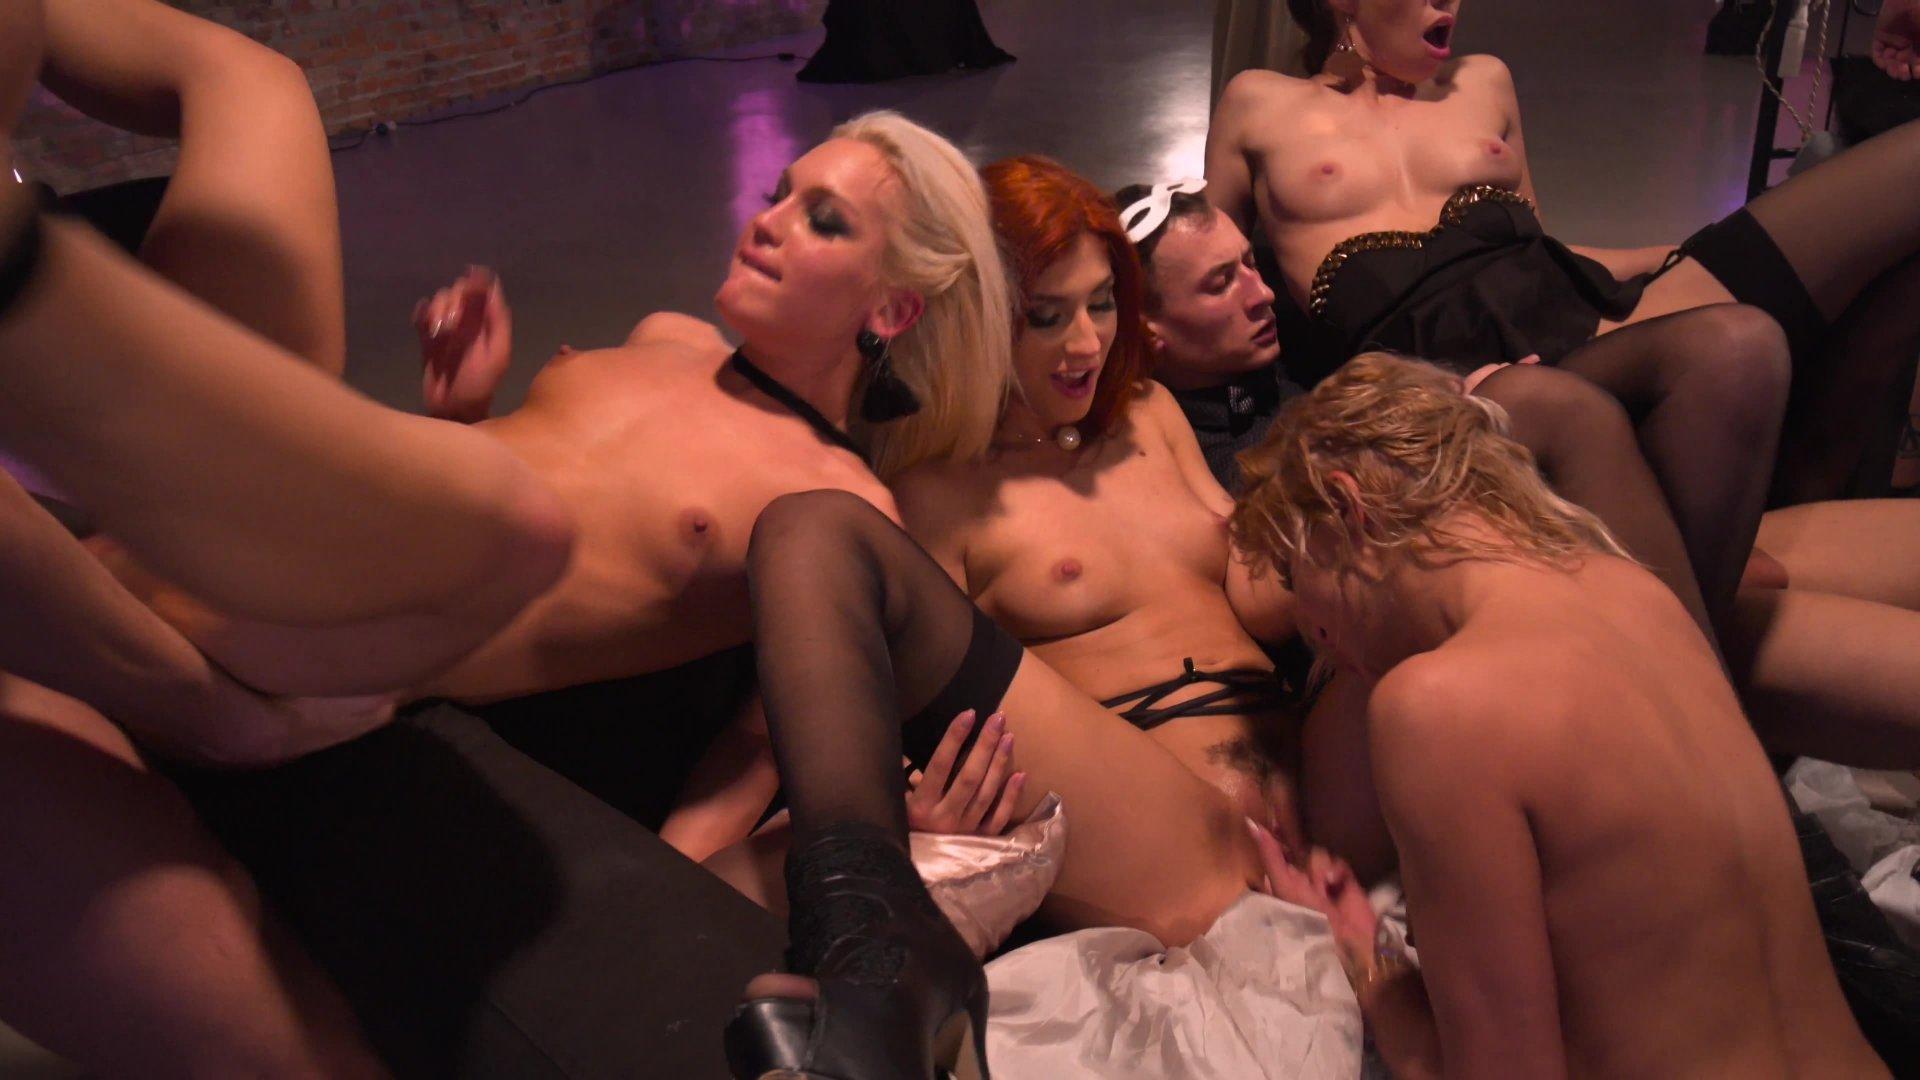 Club cinema dorcel porn